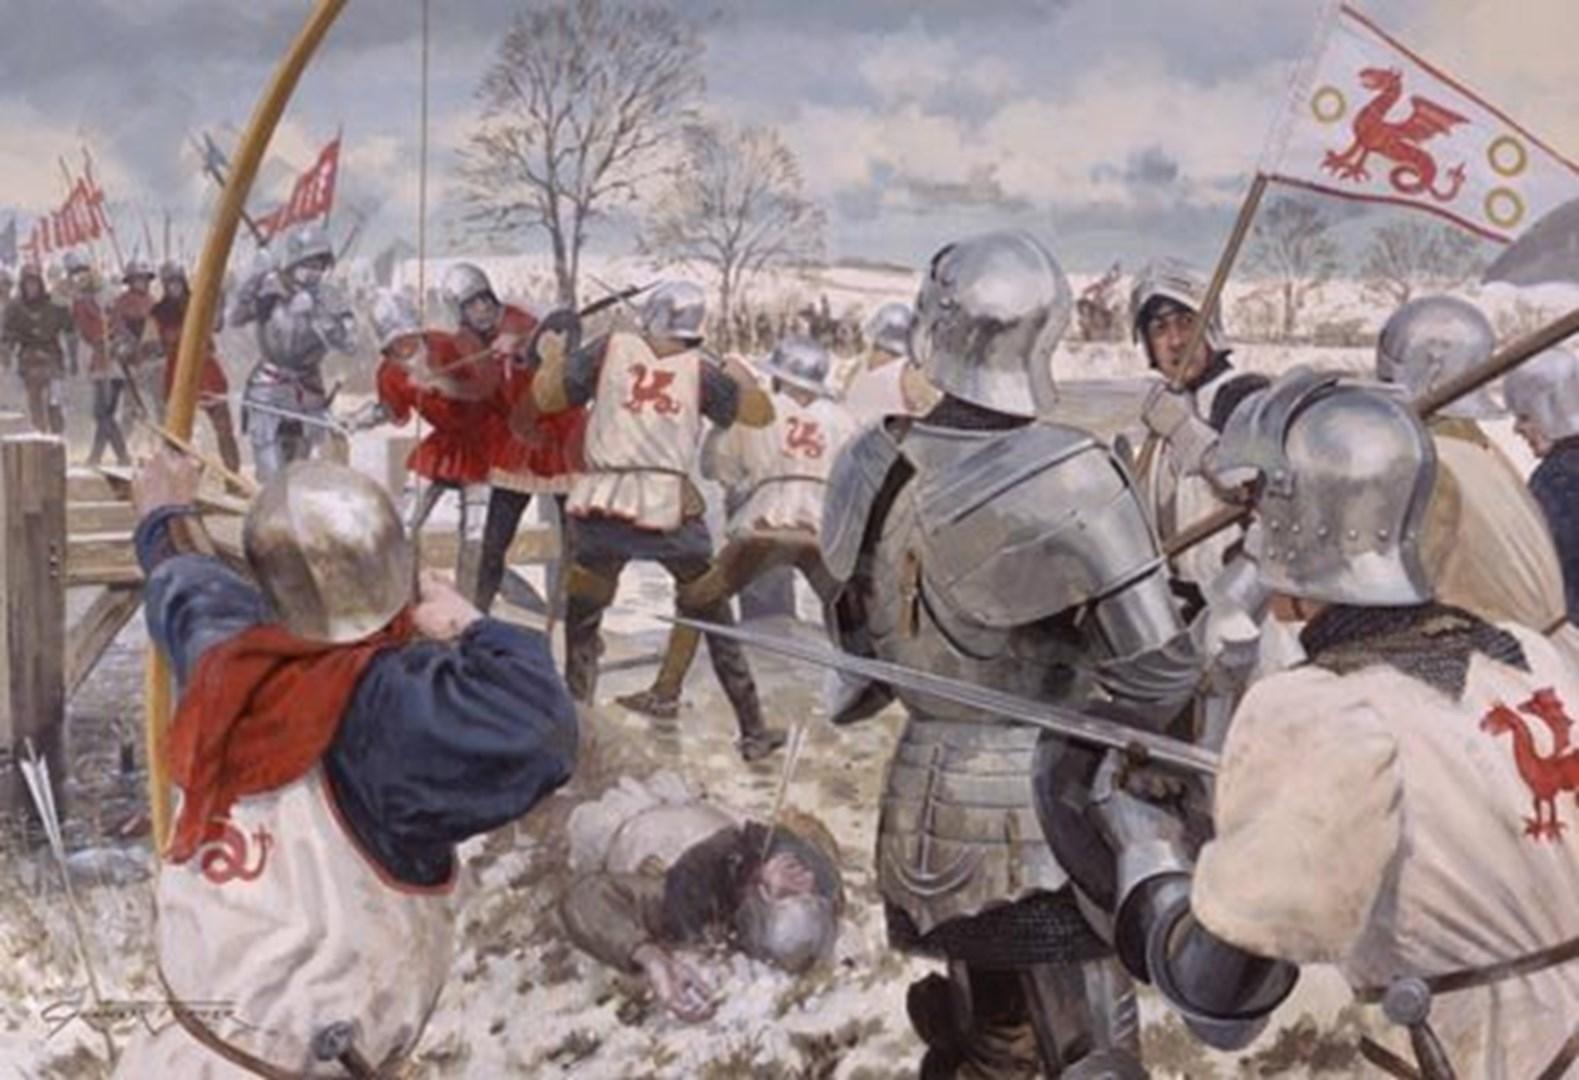 Bitka kod Tautona: Sneg i vetar osigurali masakr (VIDEO)